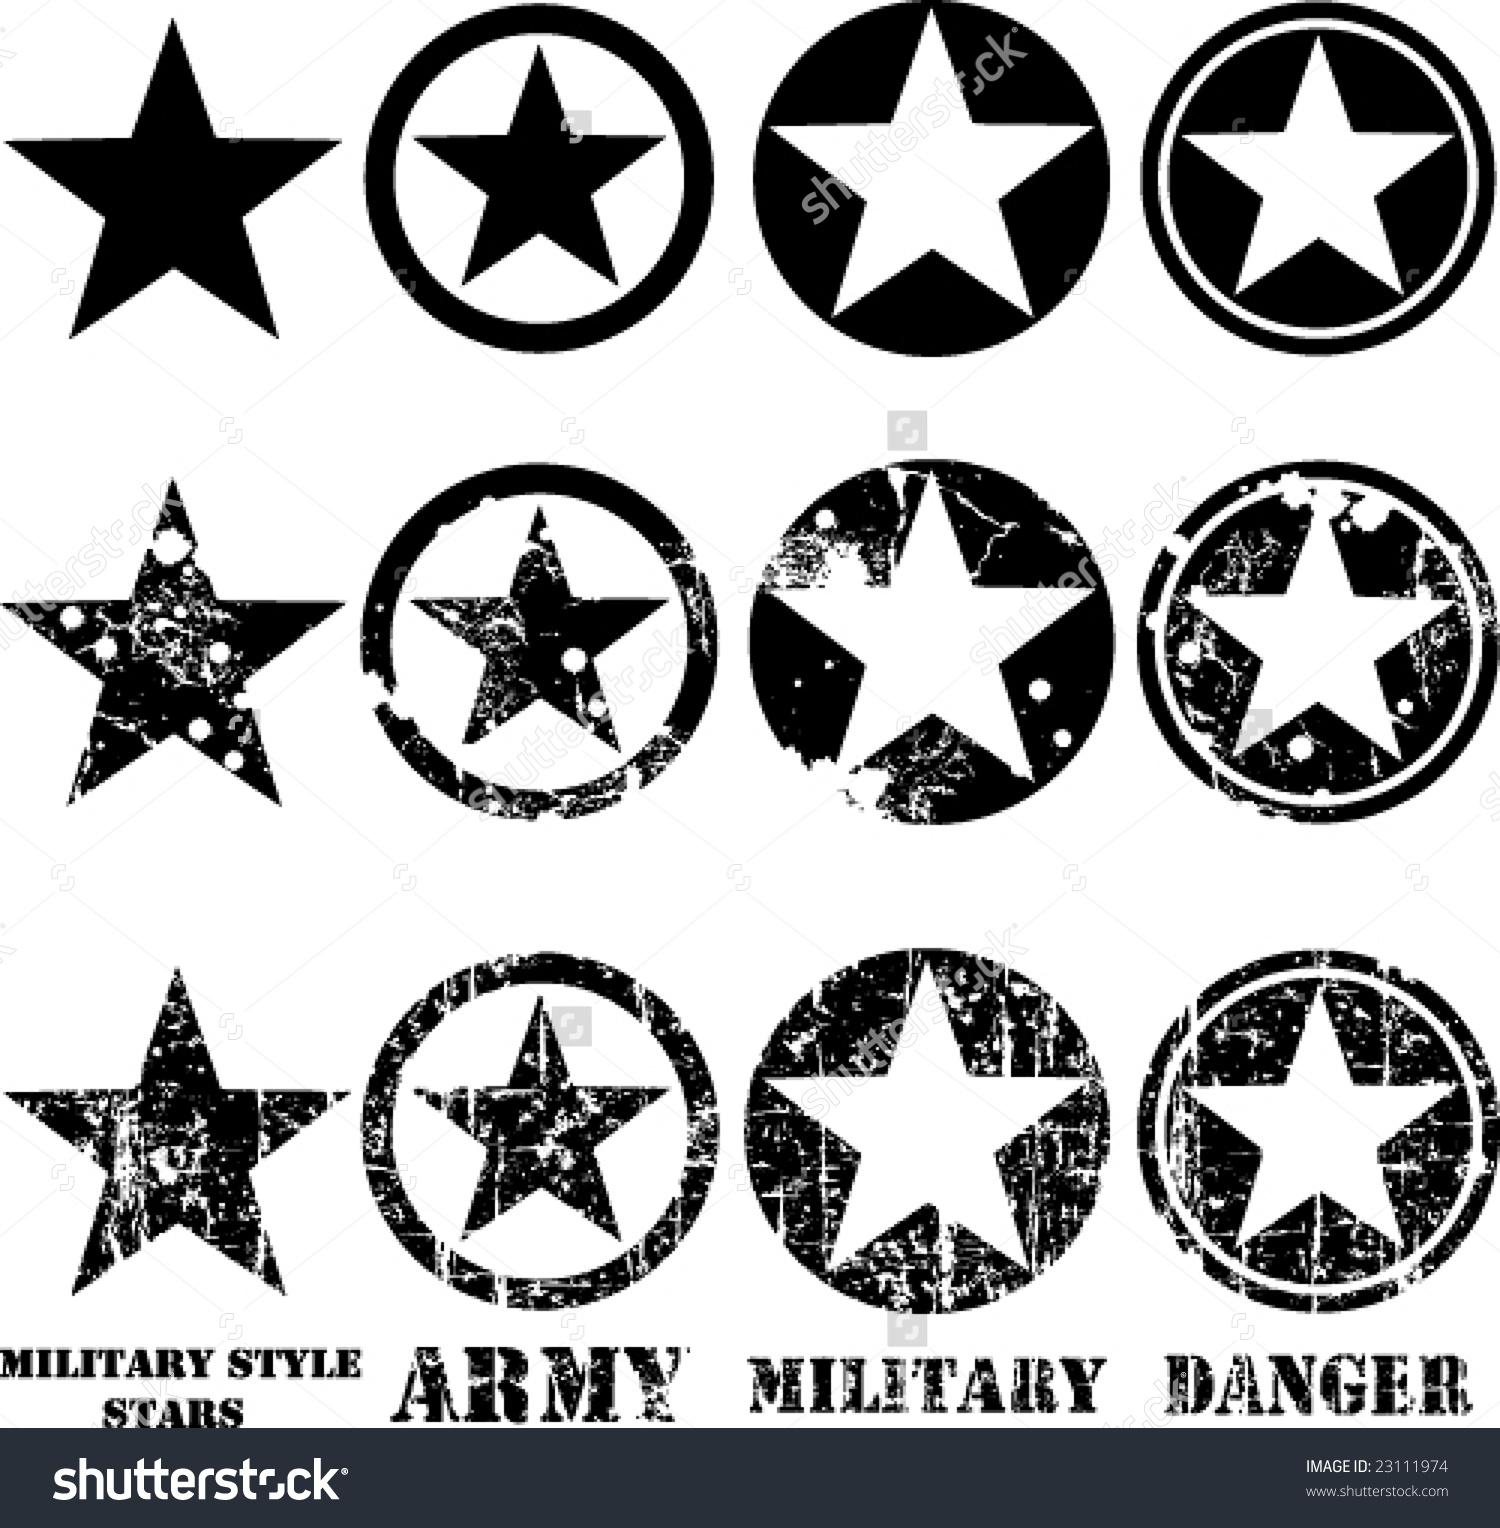 Star Symbol Vector at GetDrawings.com.